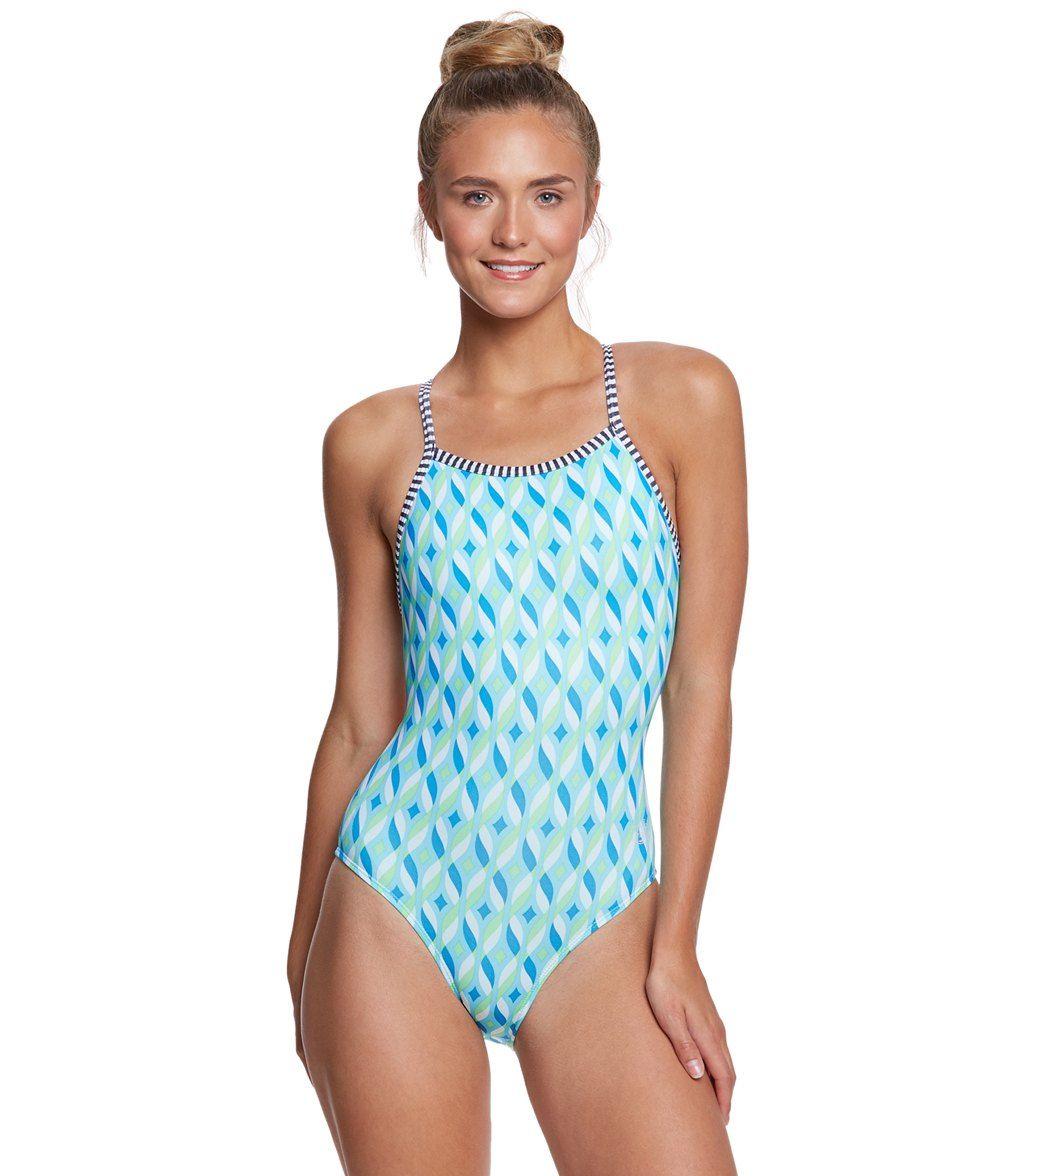 2fc07400e3 Dolfin Uglies Women s Tinsel V-2 Back One Piece Swimsuit at SwimOutlet.com  Swim